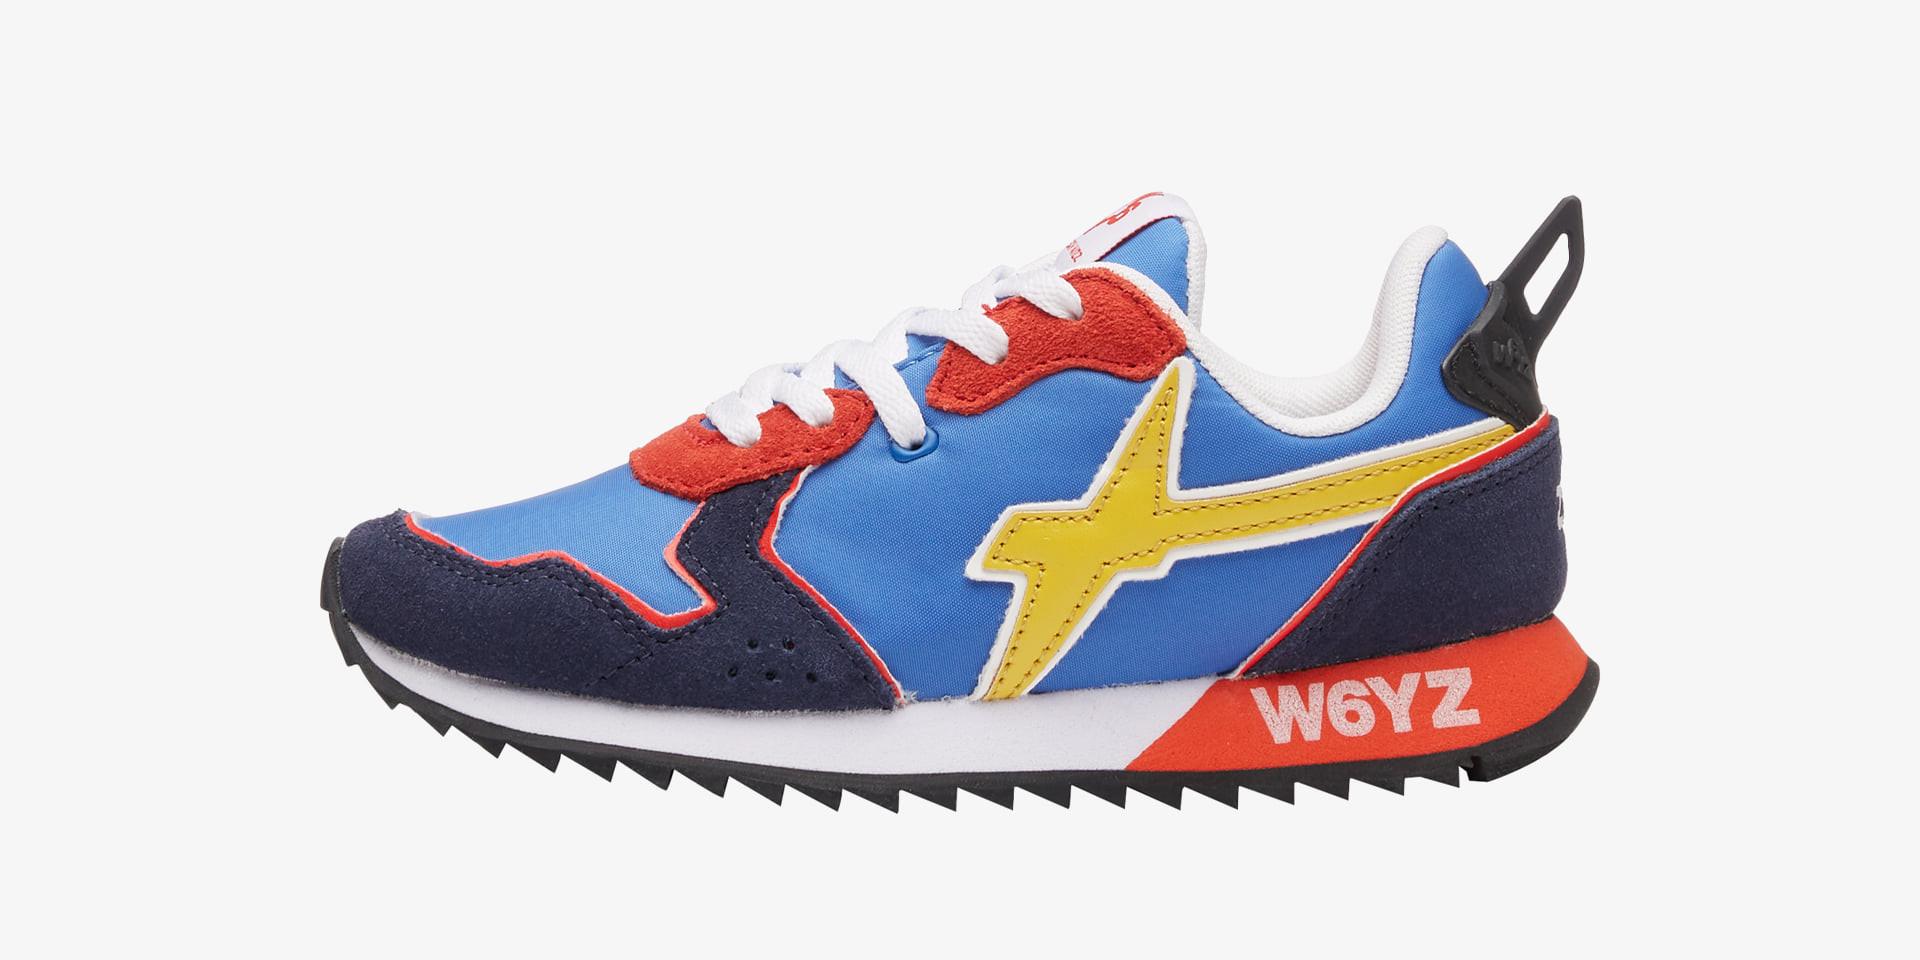 JET-J - Sneaker in tessuto e pelle - Blu-Azzurro-Rosso